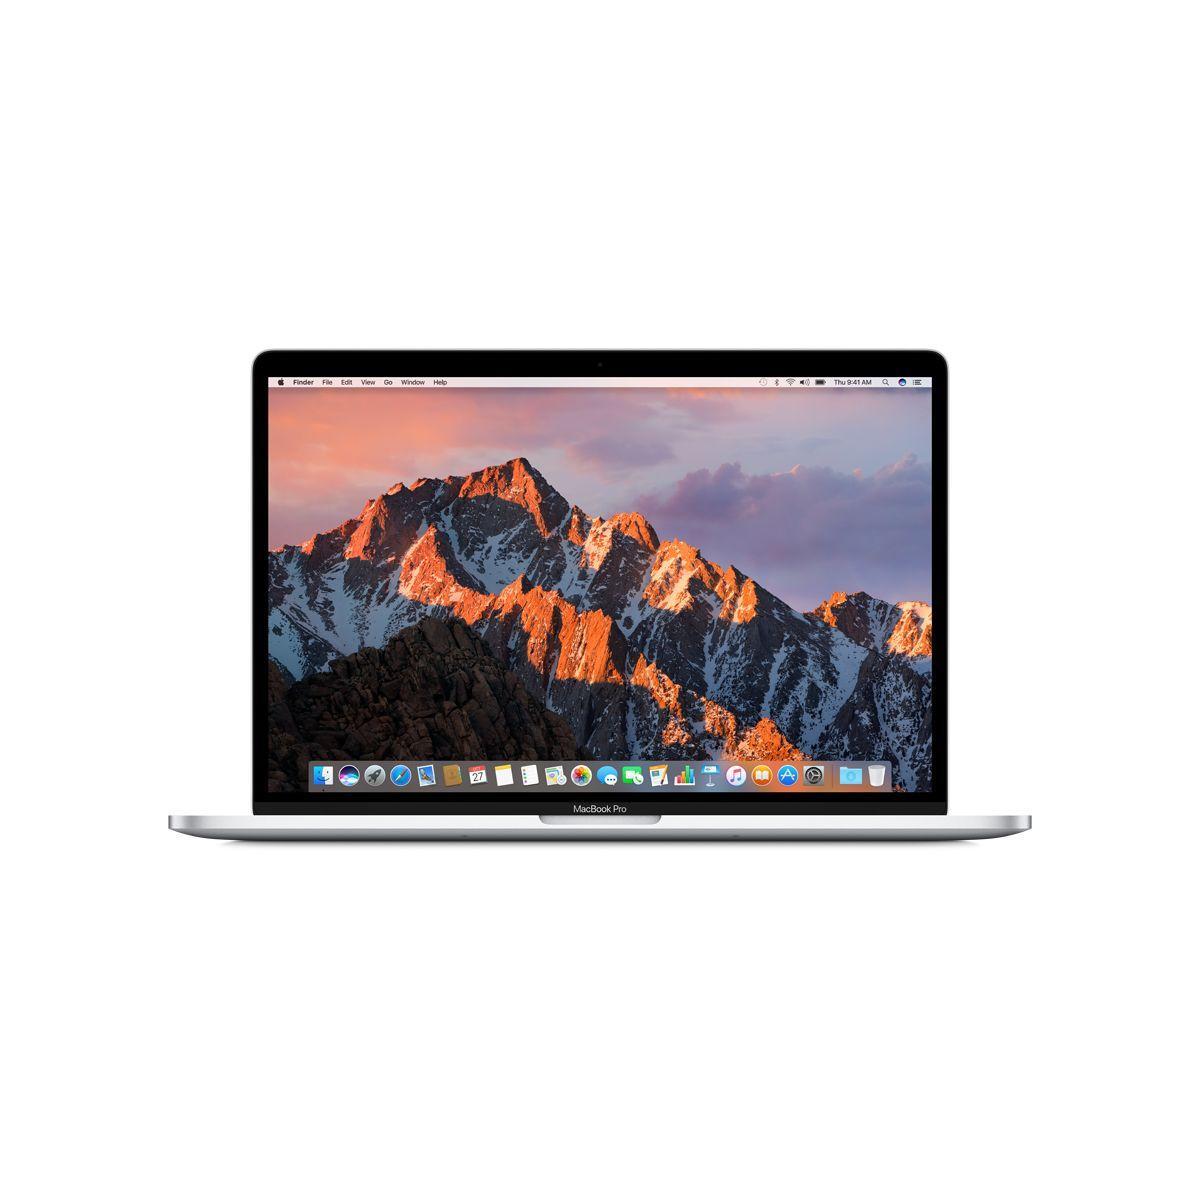 Portable macbook pro 15 i7 512go argent (photo)